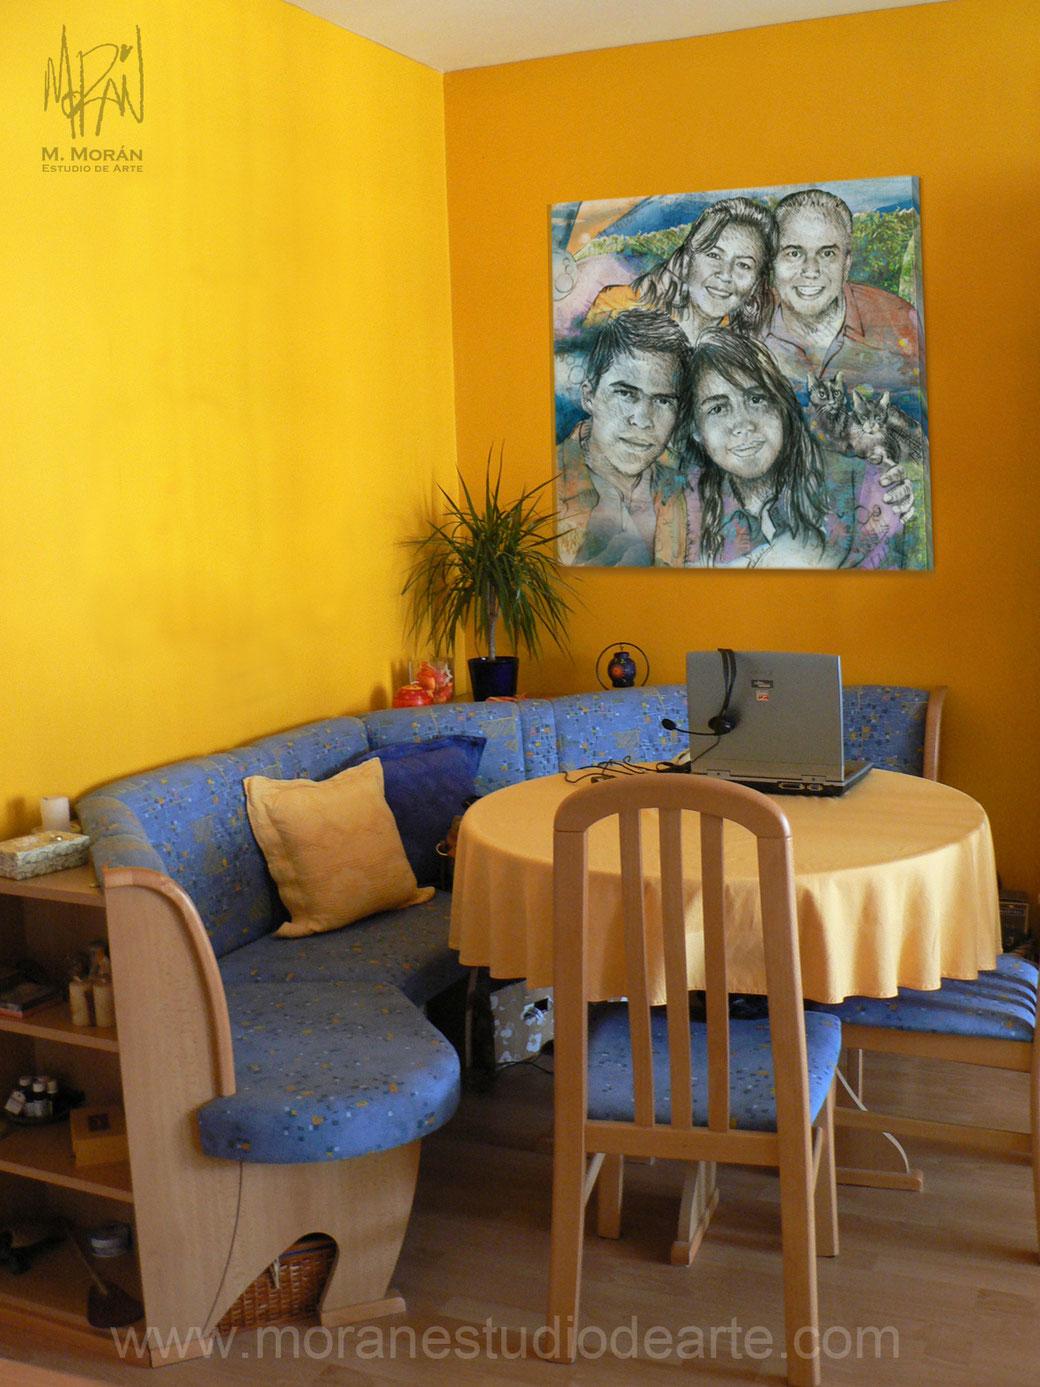 cuadro para pared amarilla